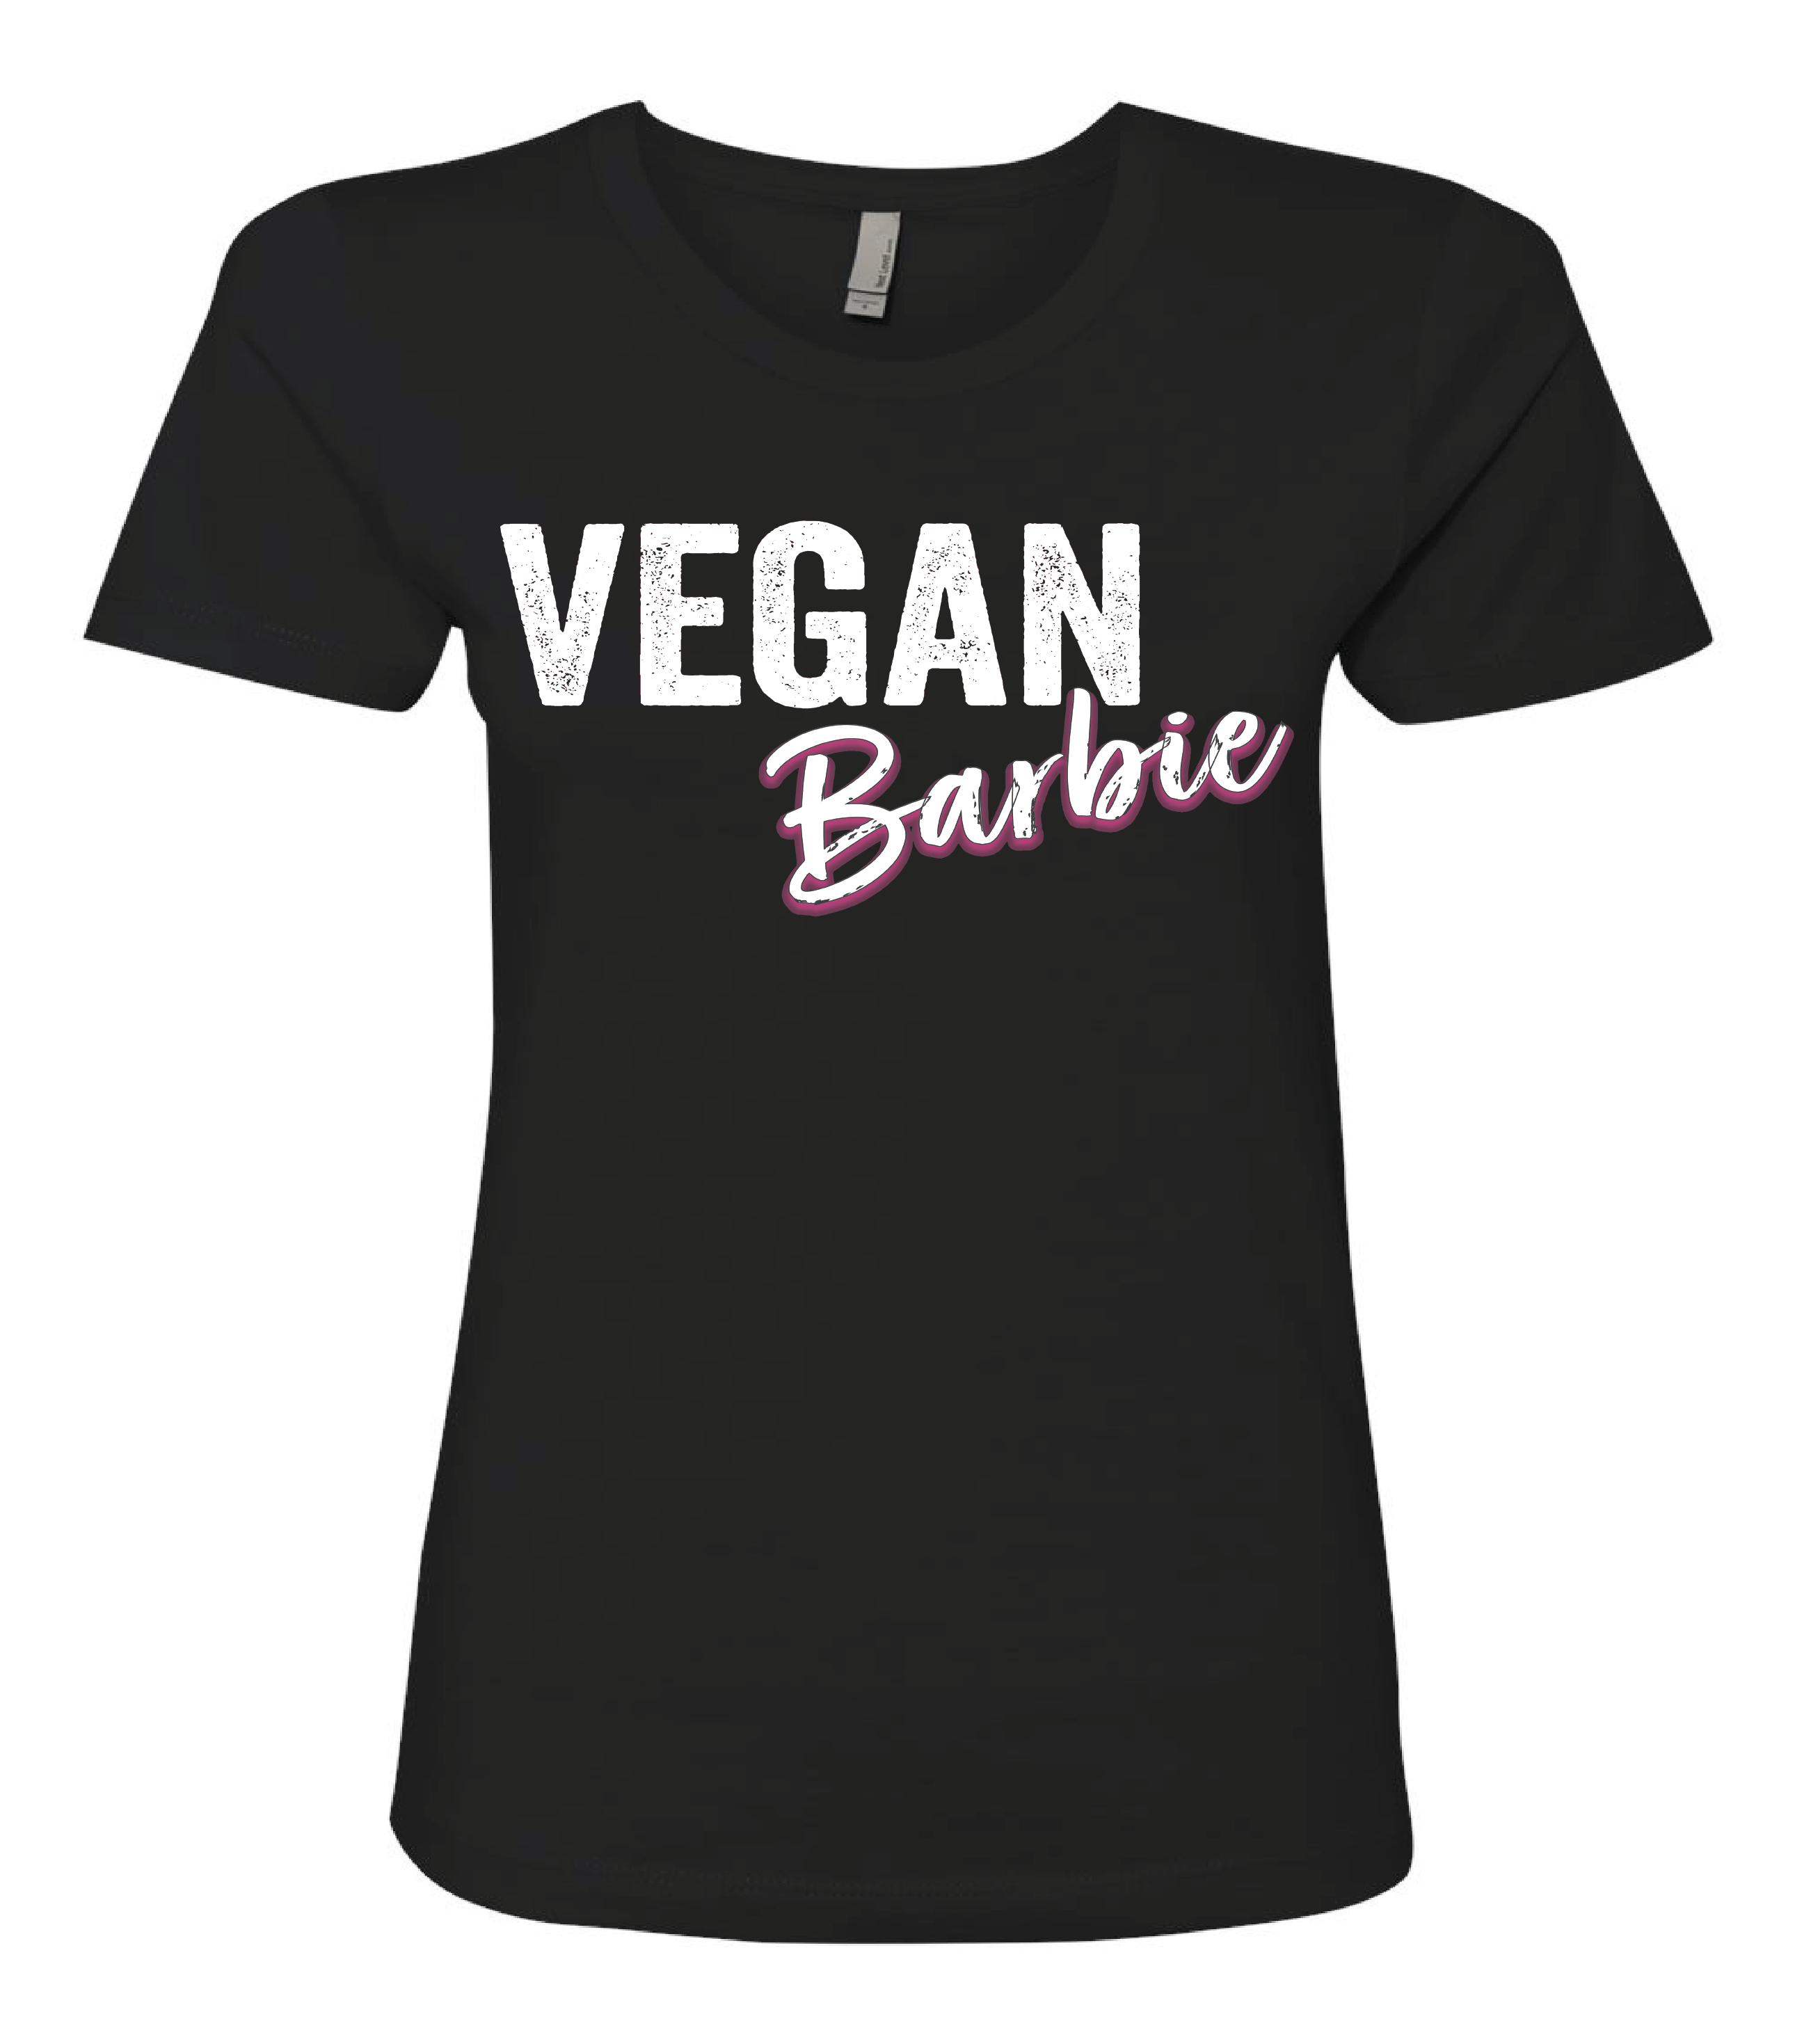 Vegan Graphic Tee, Vegan Barbie